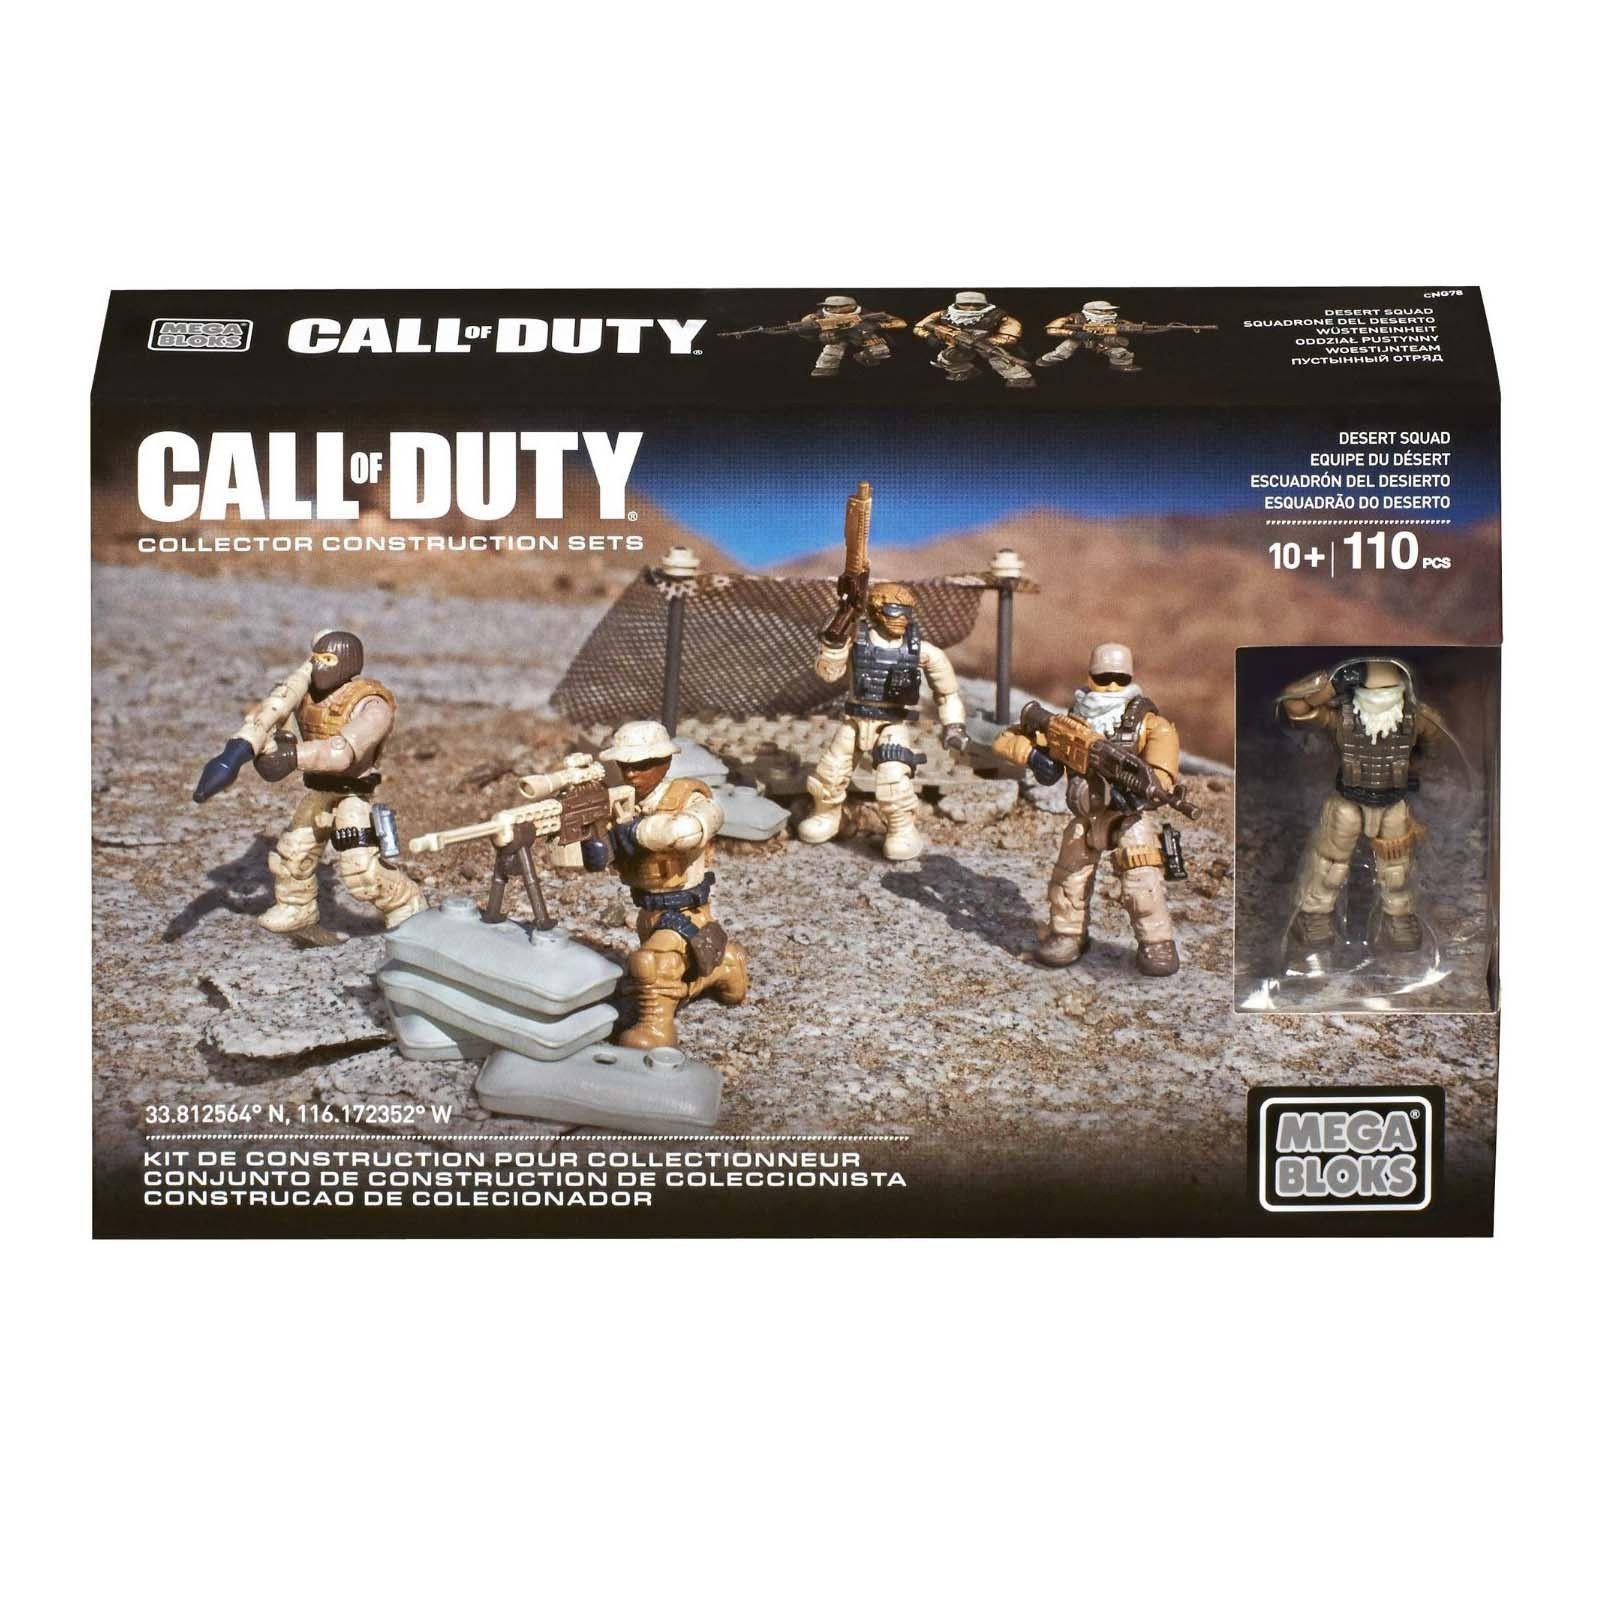 Mega Construx Call Of Duty Desert Sniper Building Set New Fast Free Shipping